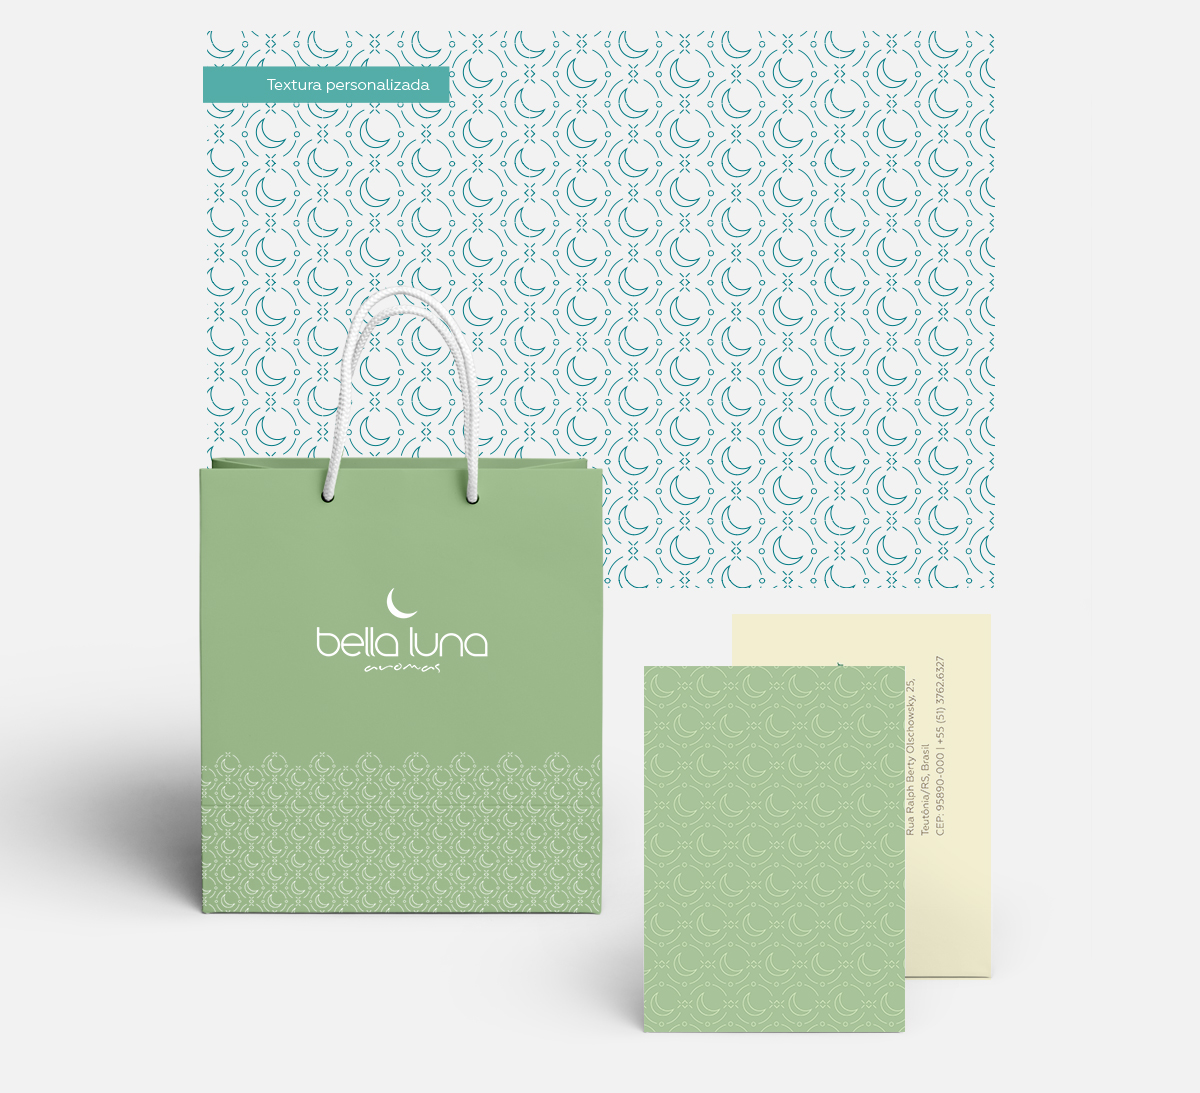 criacao-branding-material-bella-luna-toyz-propaganda_1200